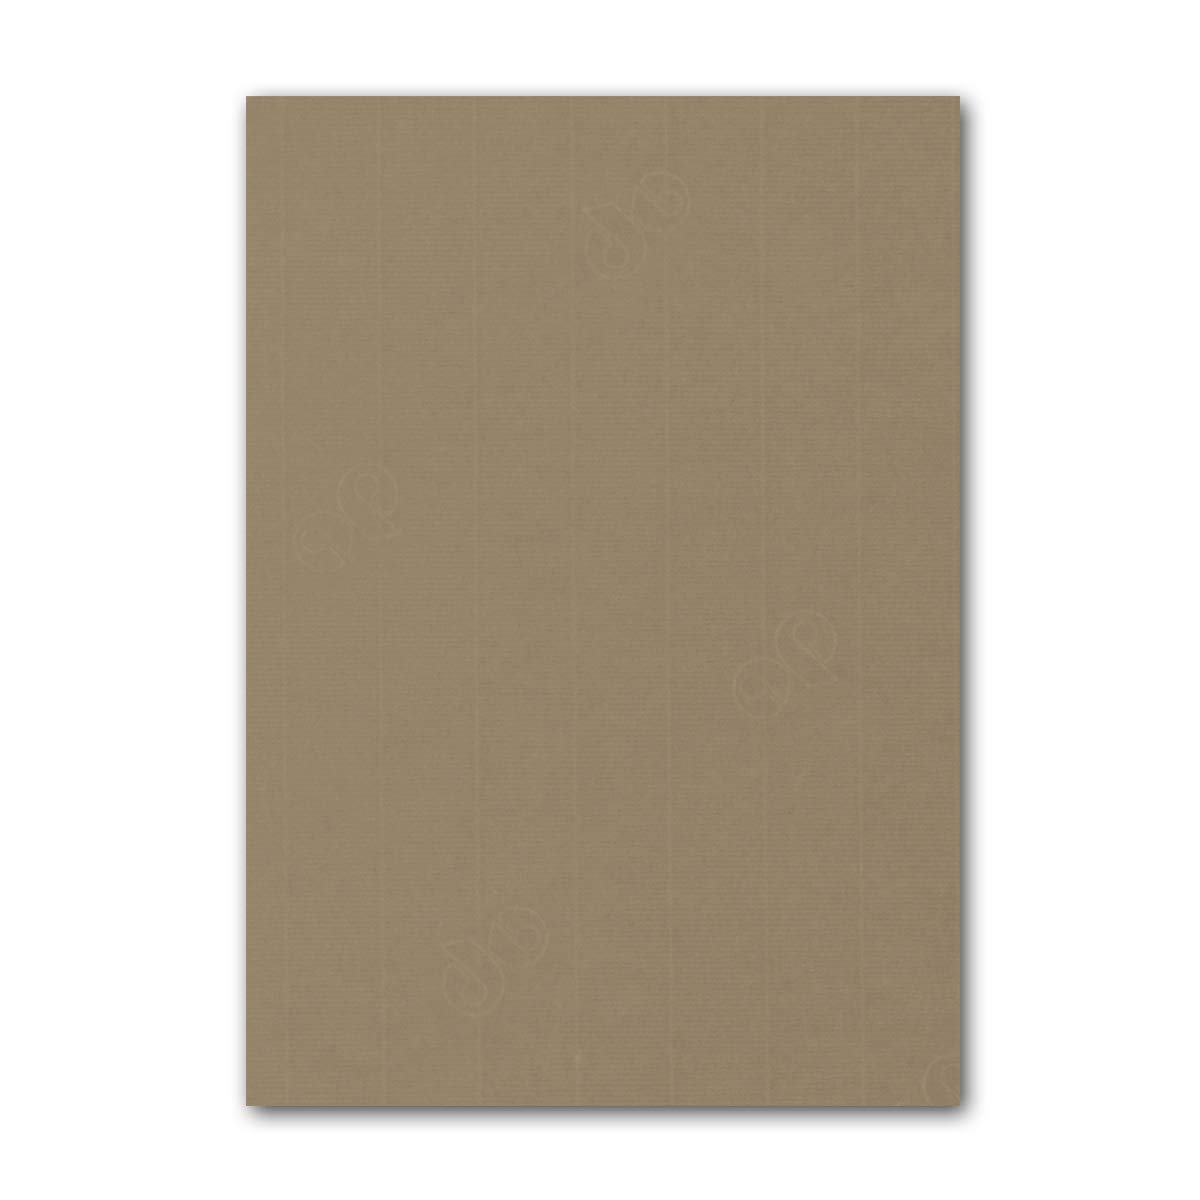 ARTOZ 150x Briefpapier + Bastelpapier Bastelkarton - Taupe - DIN A4 297 x 210 mm – Edle Egoutteur-Rippung – Hochwertiges 220 g m² Tonpapier – Scrapbooking Papier 586 - Taupe 100 Stück